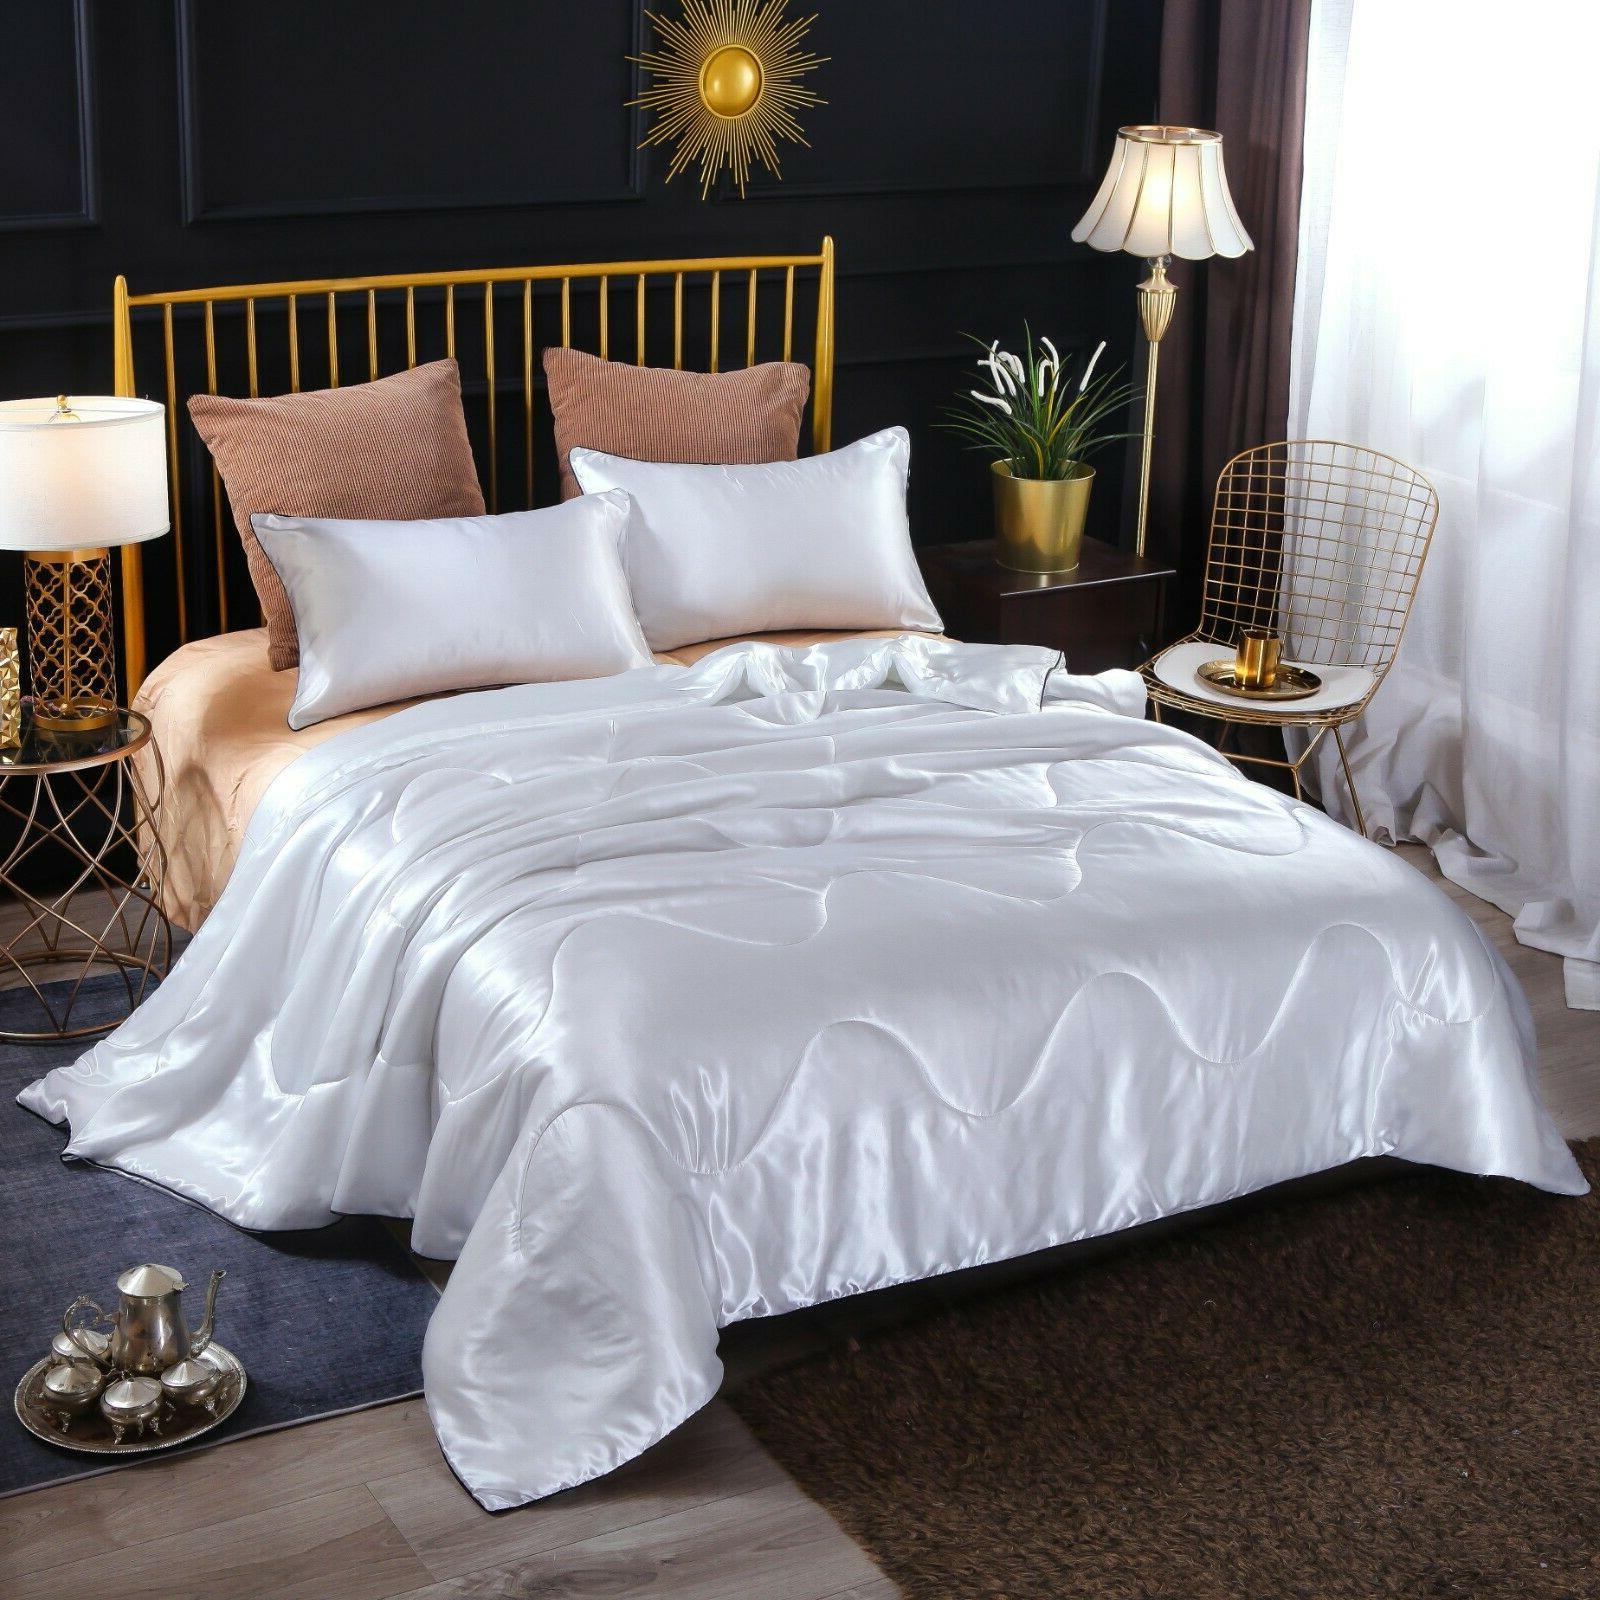 Solid Santin Silk Quilt Comforter Soft Doona Pillowcase